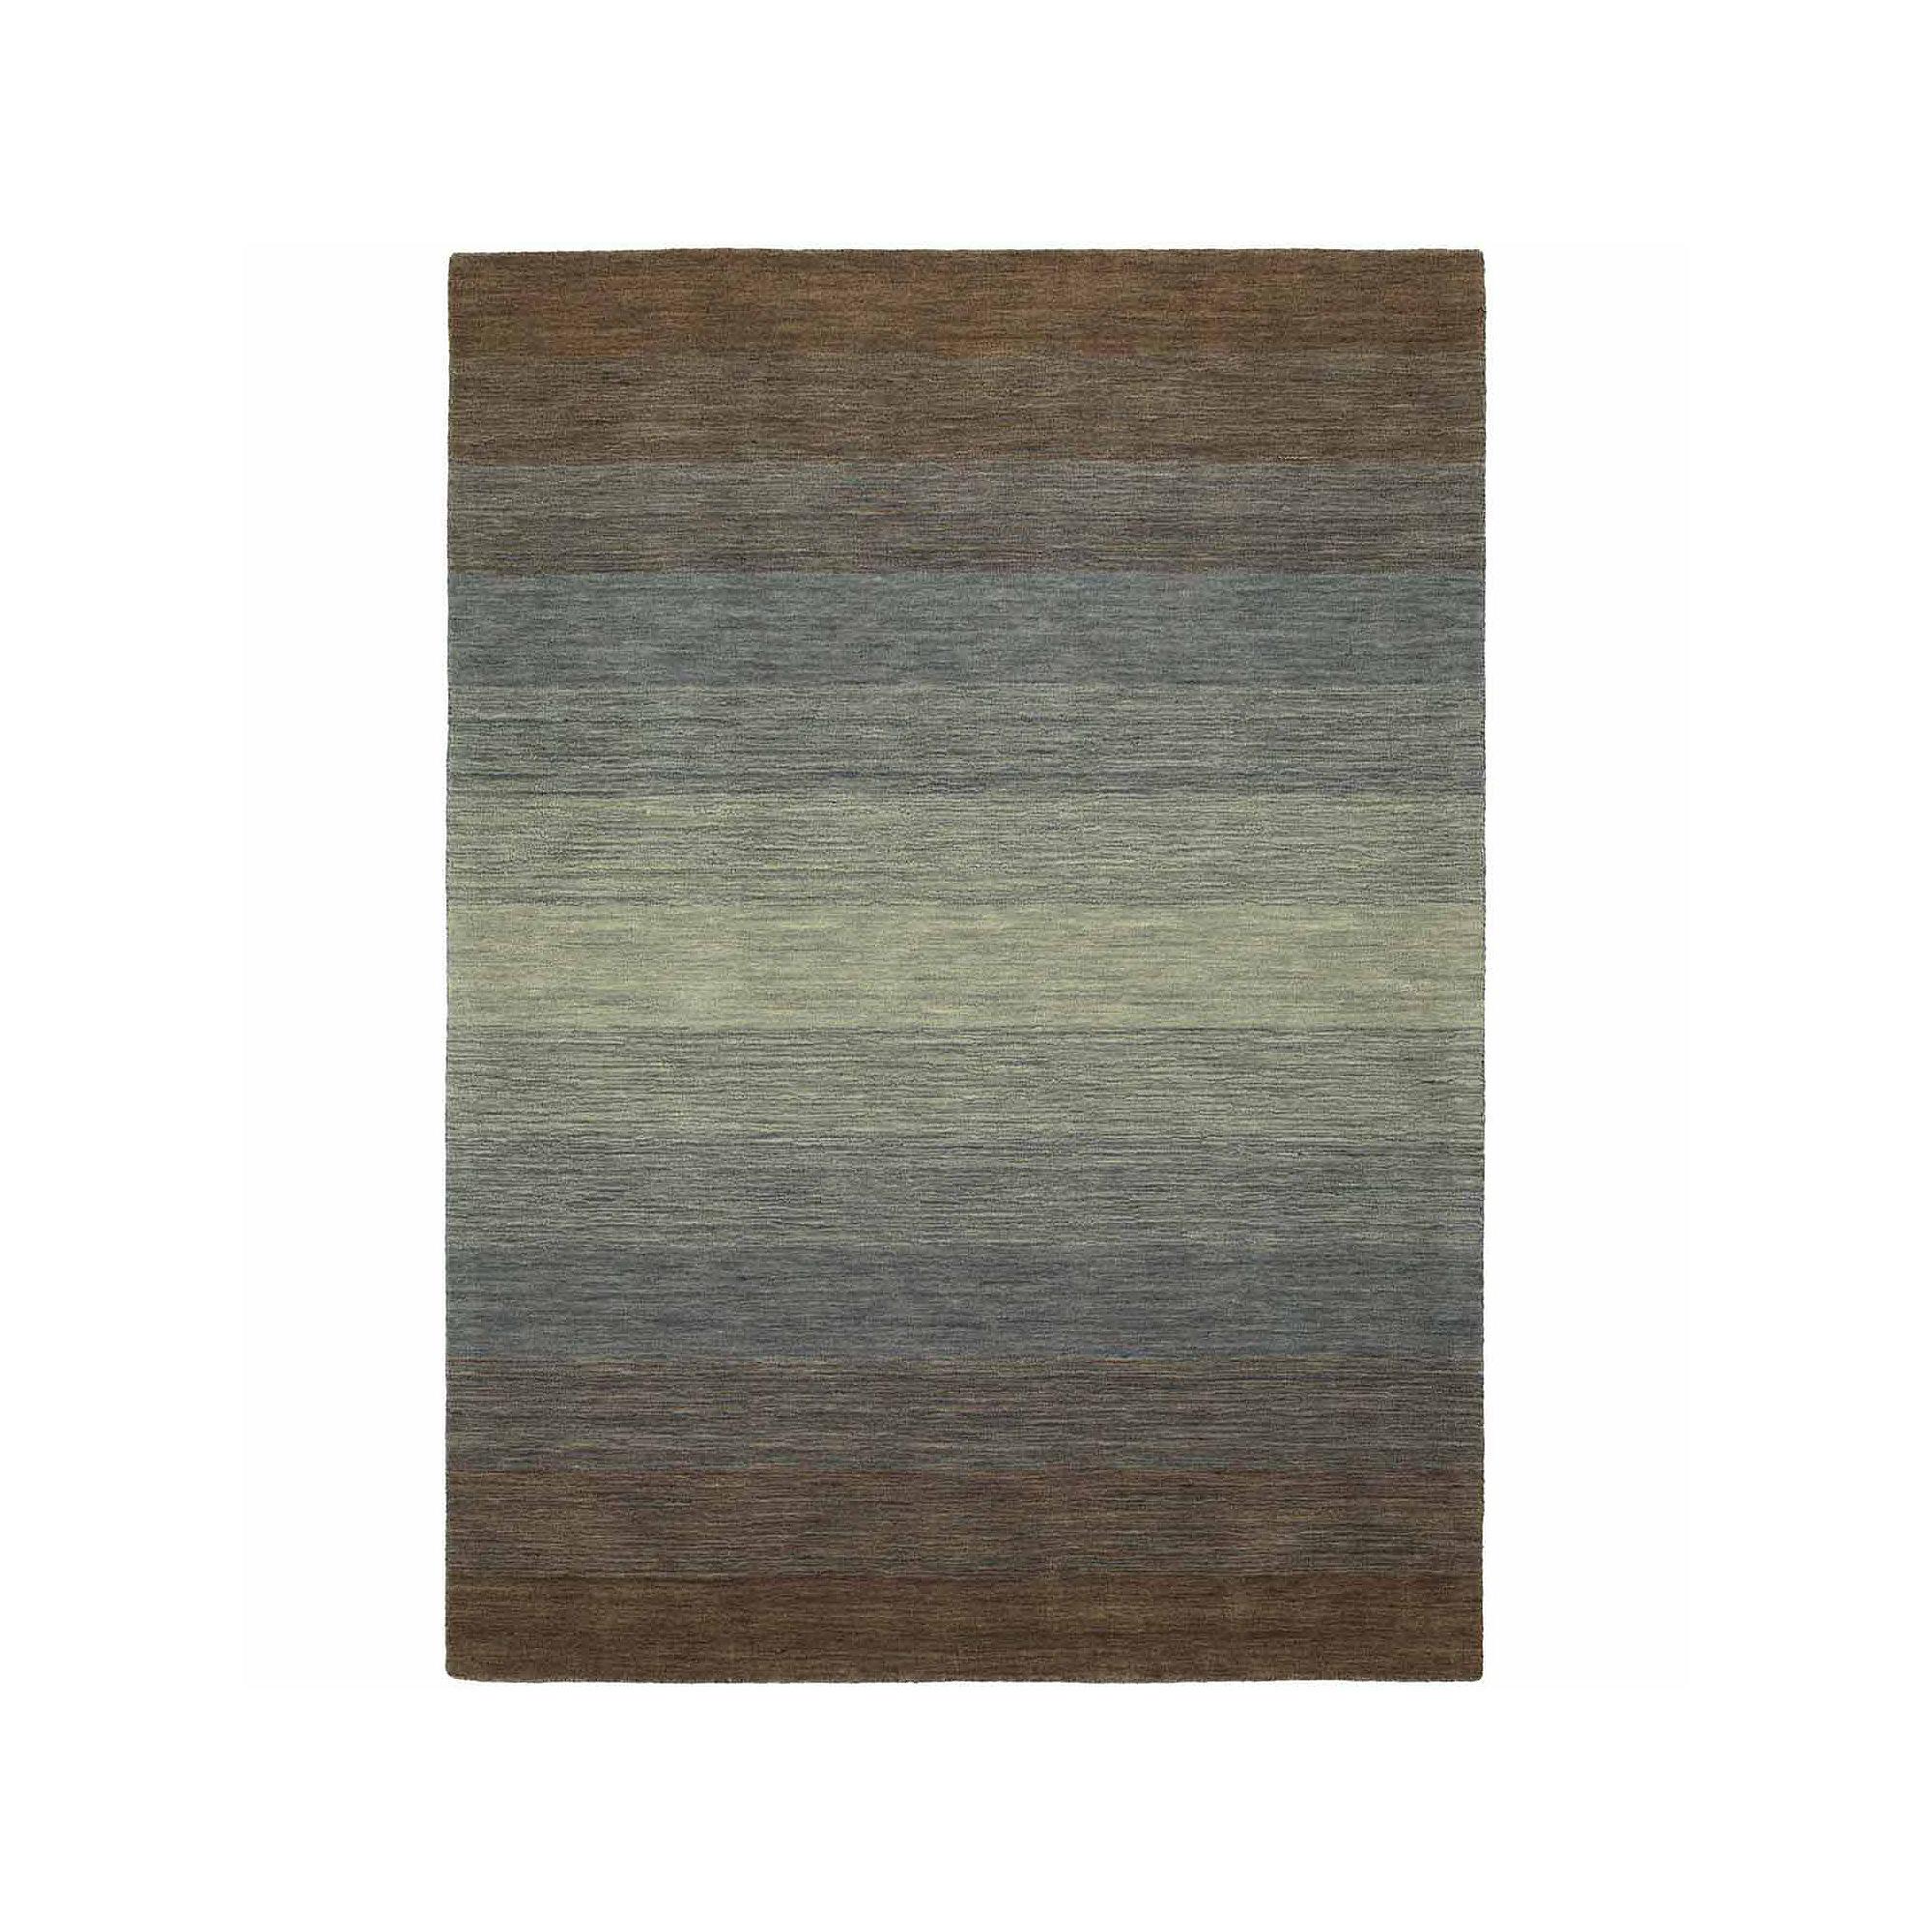 Kaleen Shades Ombre Wool Rectangular Area Rug